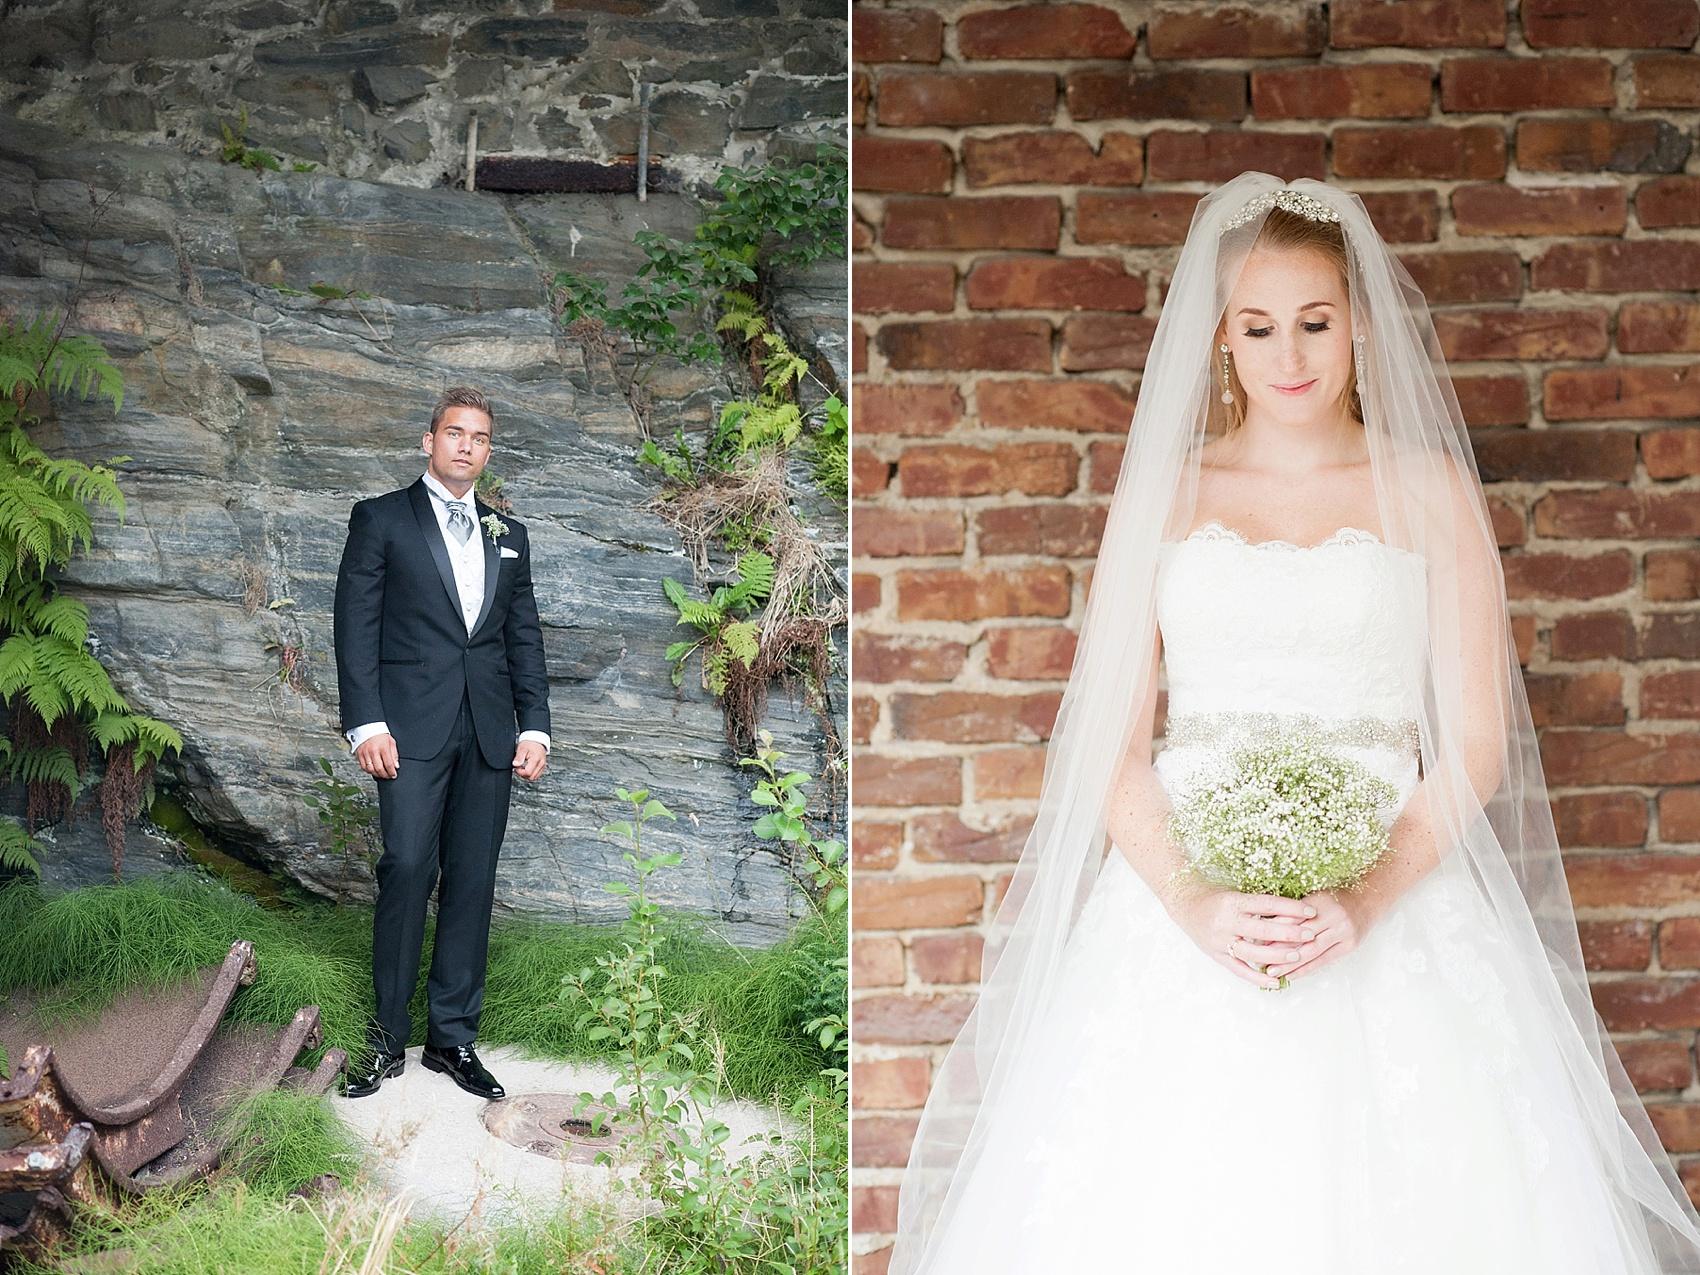 Wedding photos in Alvoen and Bergen, Norway. Destination photographer Mikkel Paige Photography.